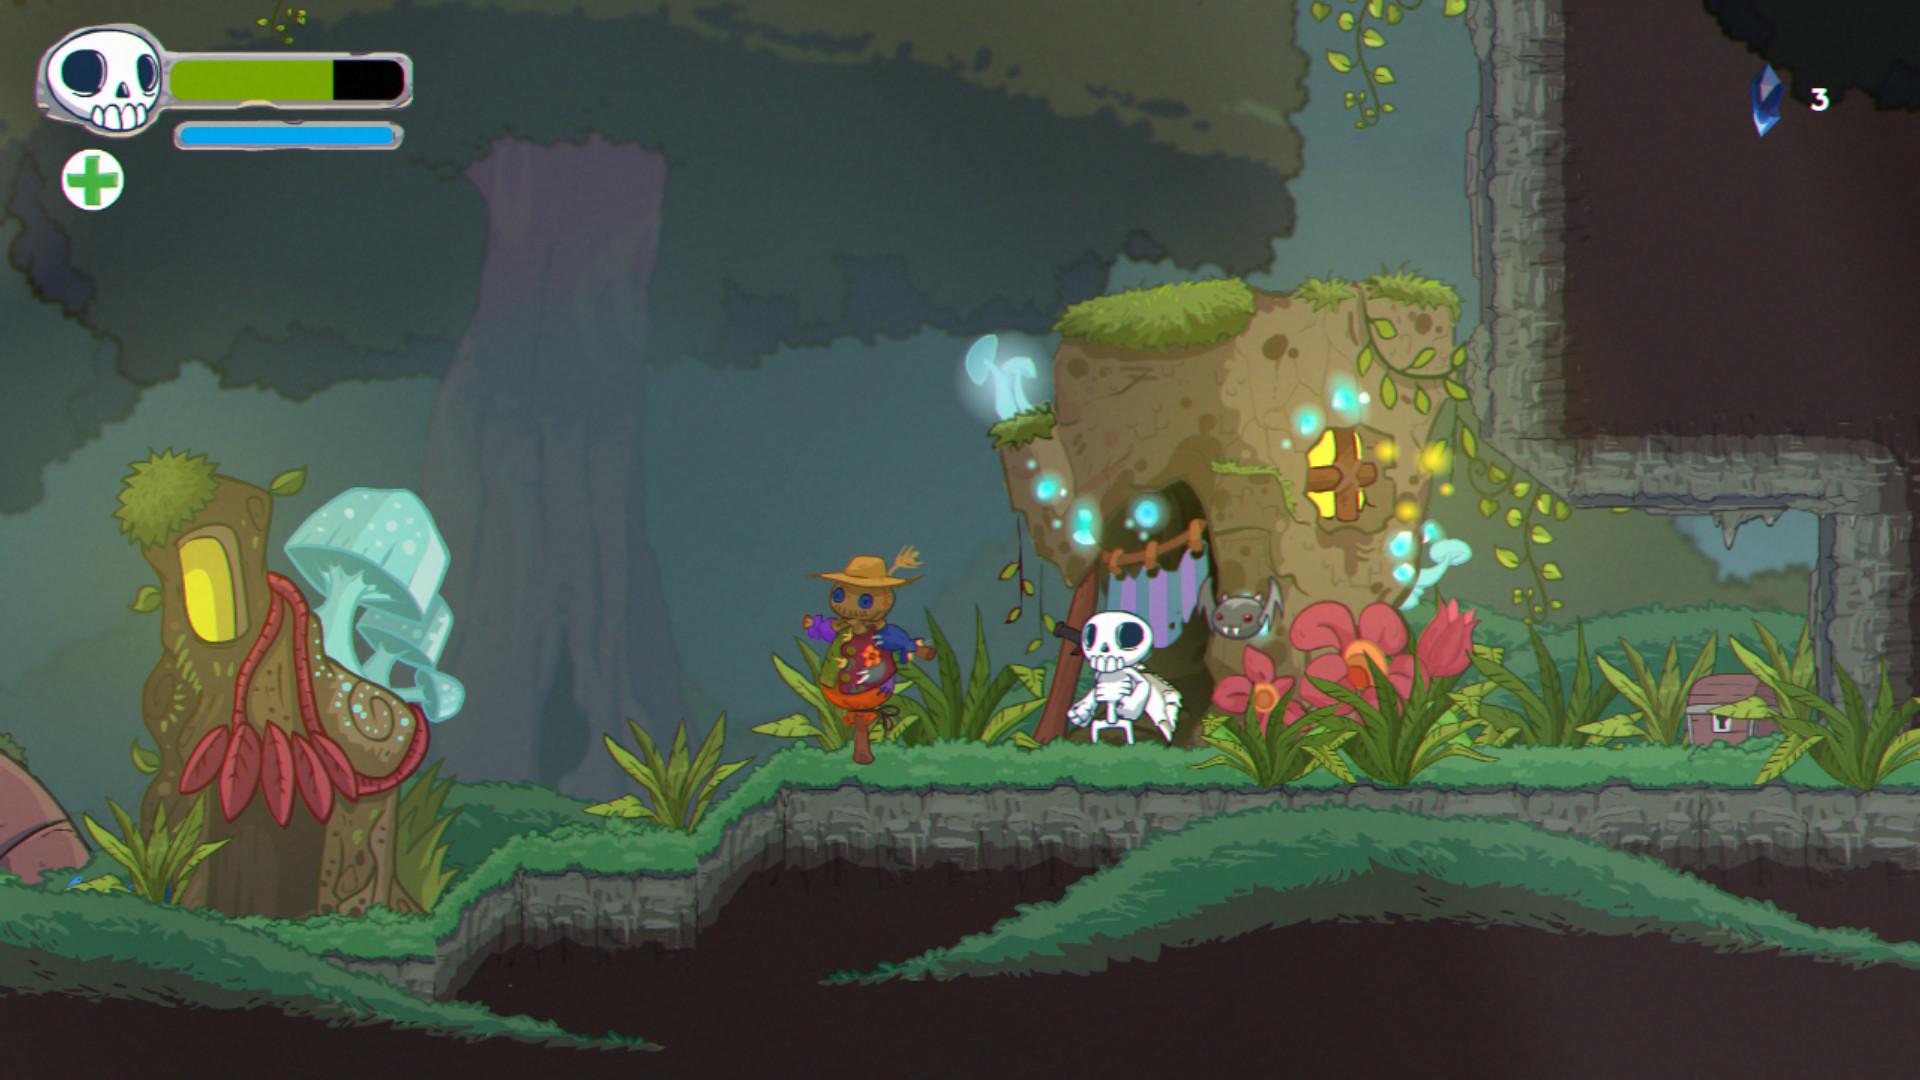 Skelattack-recensione-ambientazione-Tech-Princess